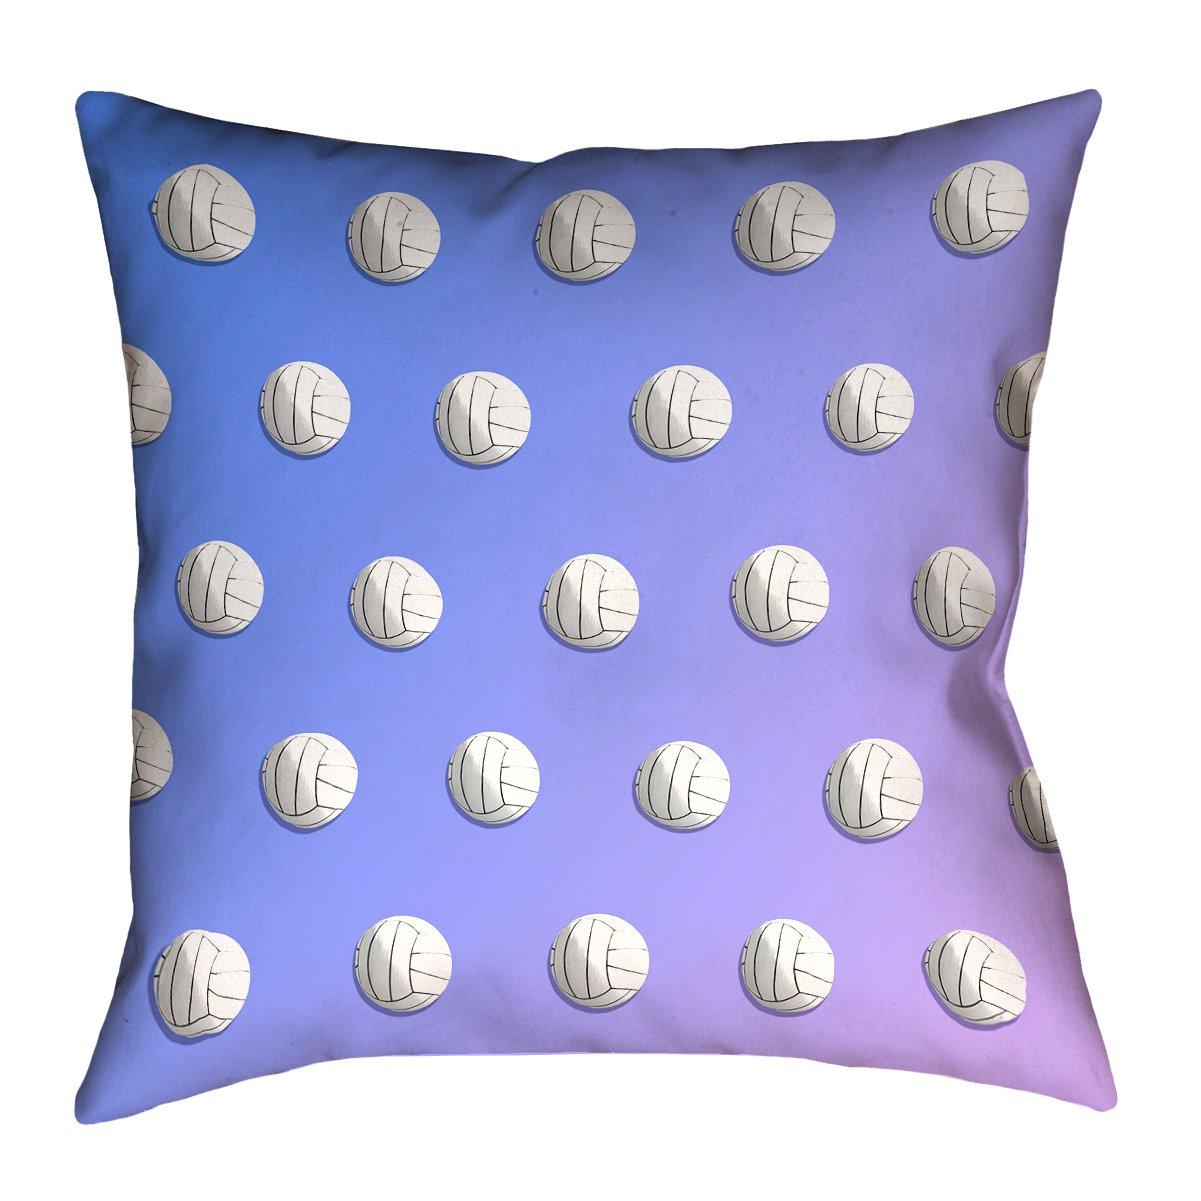 ArtVerse Katelyn Smith 18 x 18 Indoor//Outdoor UV Properties-Waterproof and Mildew Proof Blue /& Purple Ombre Volleyball Pillow